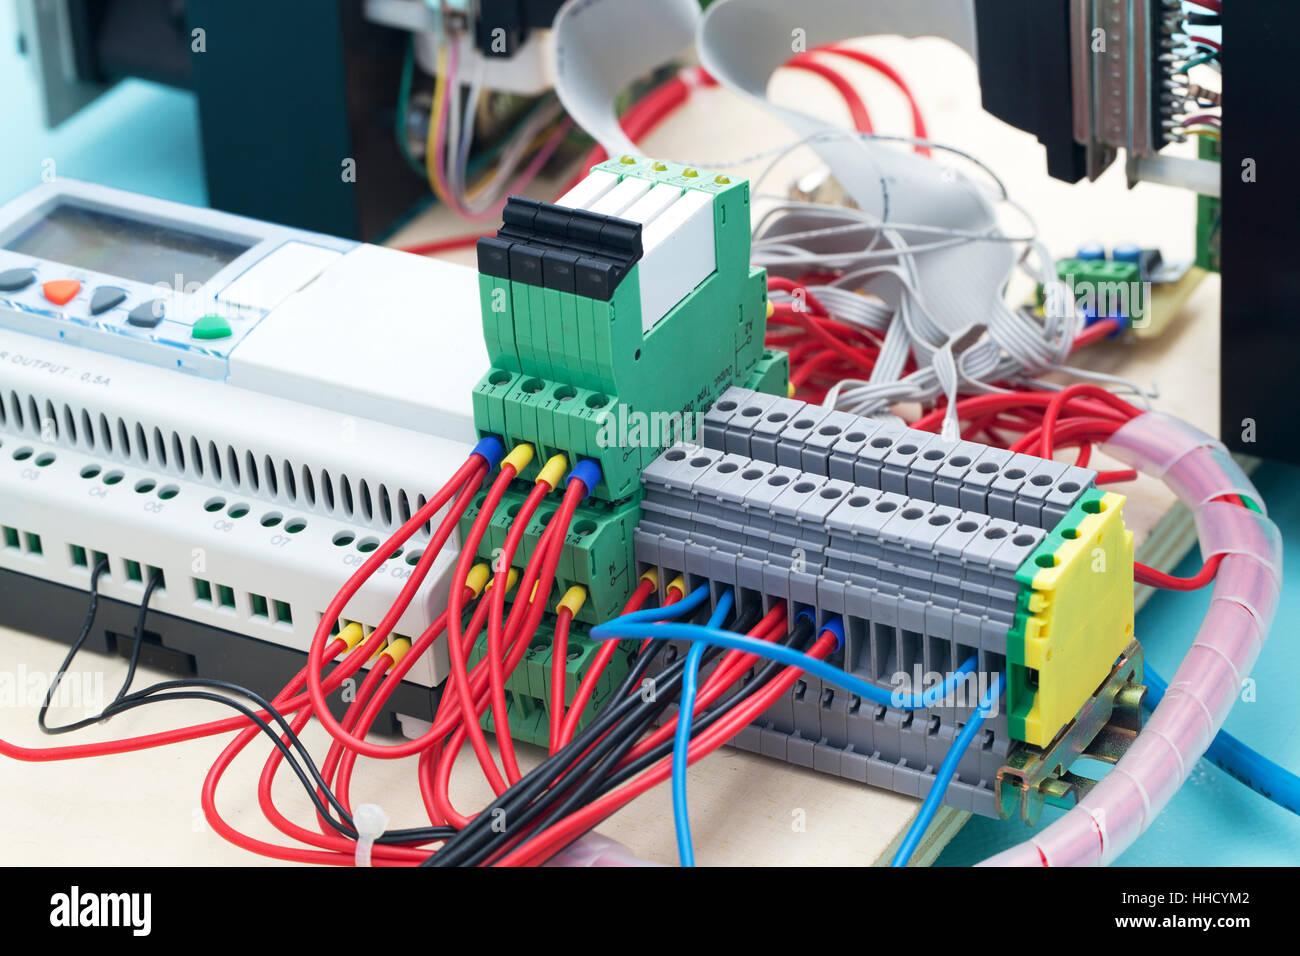 Board, Experiment, Draht, Labor, Schaltung, Prototypen, Elektronik ...